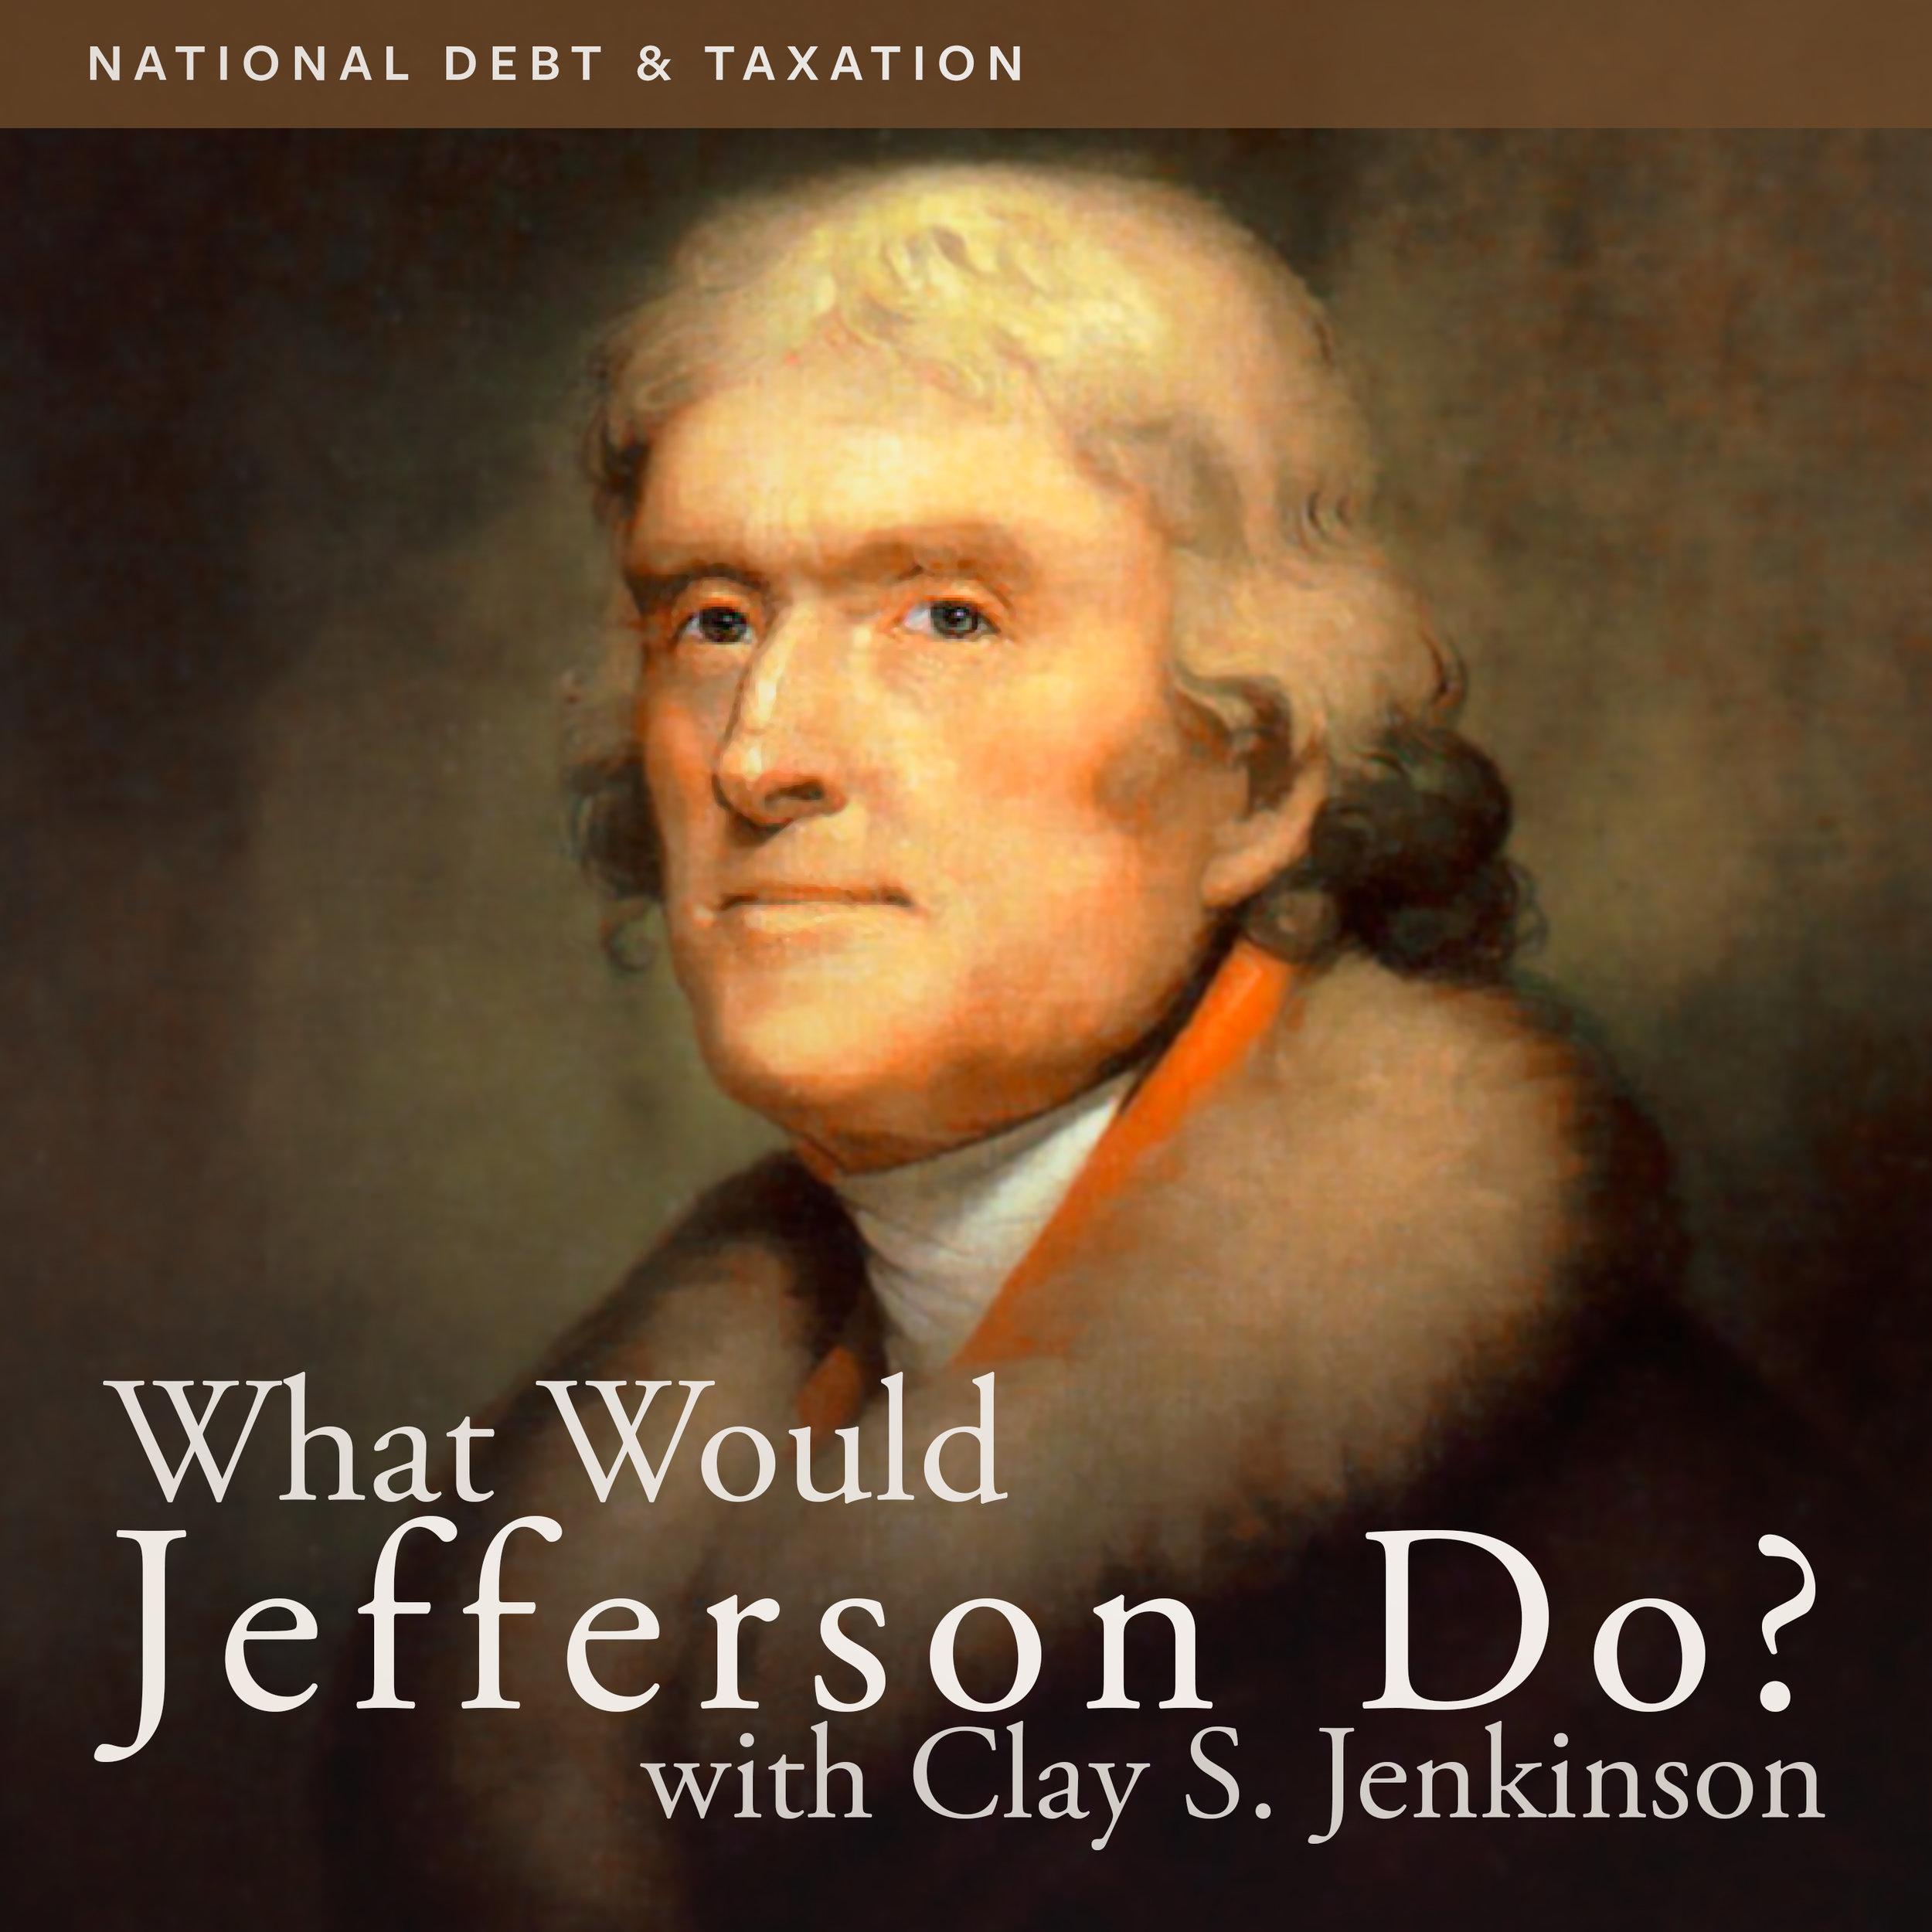 WWTJD_1259 National Debt & Taxation.jpg